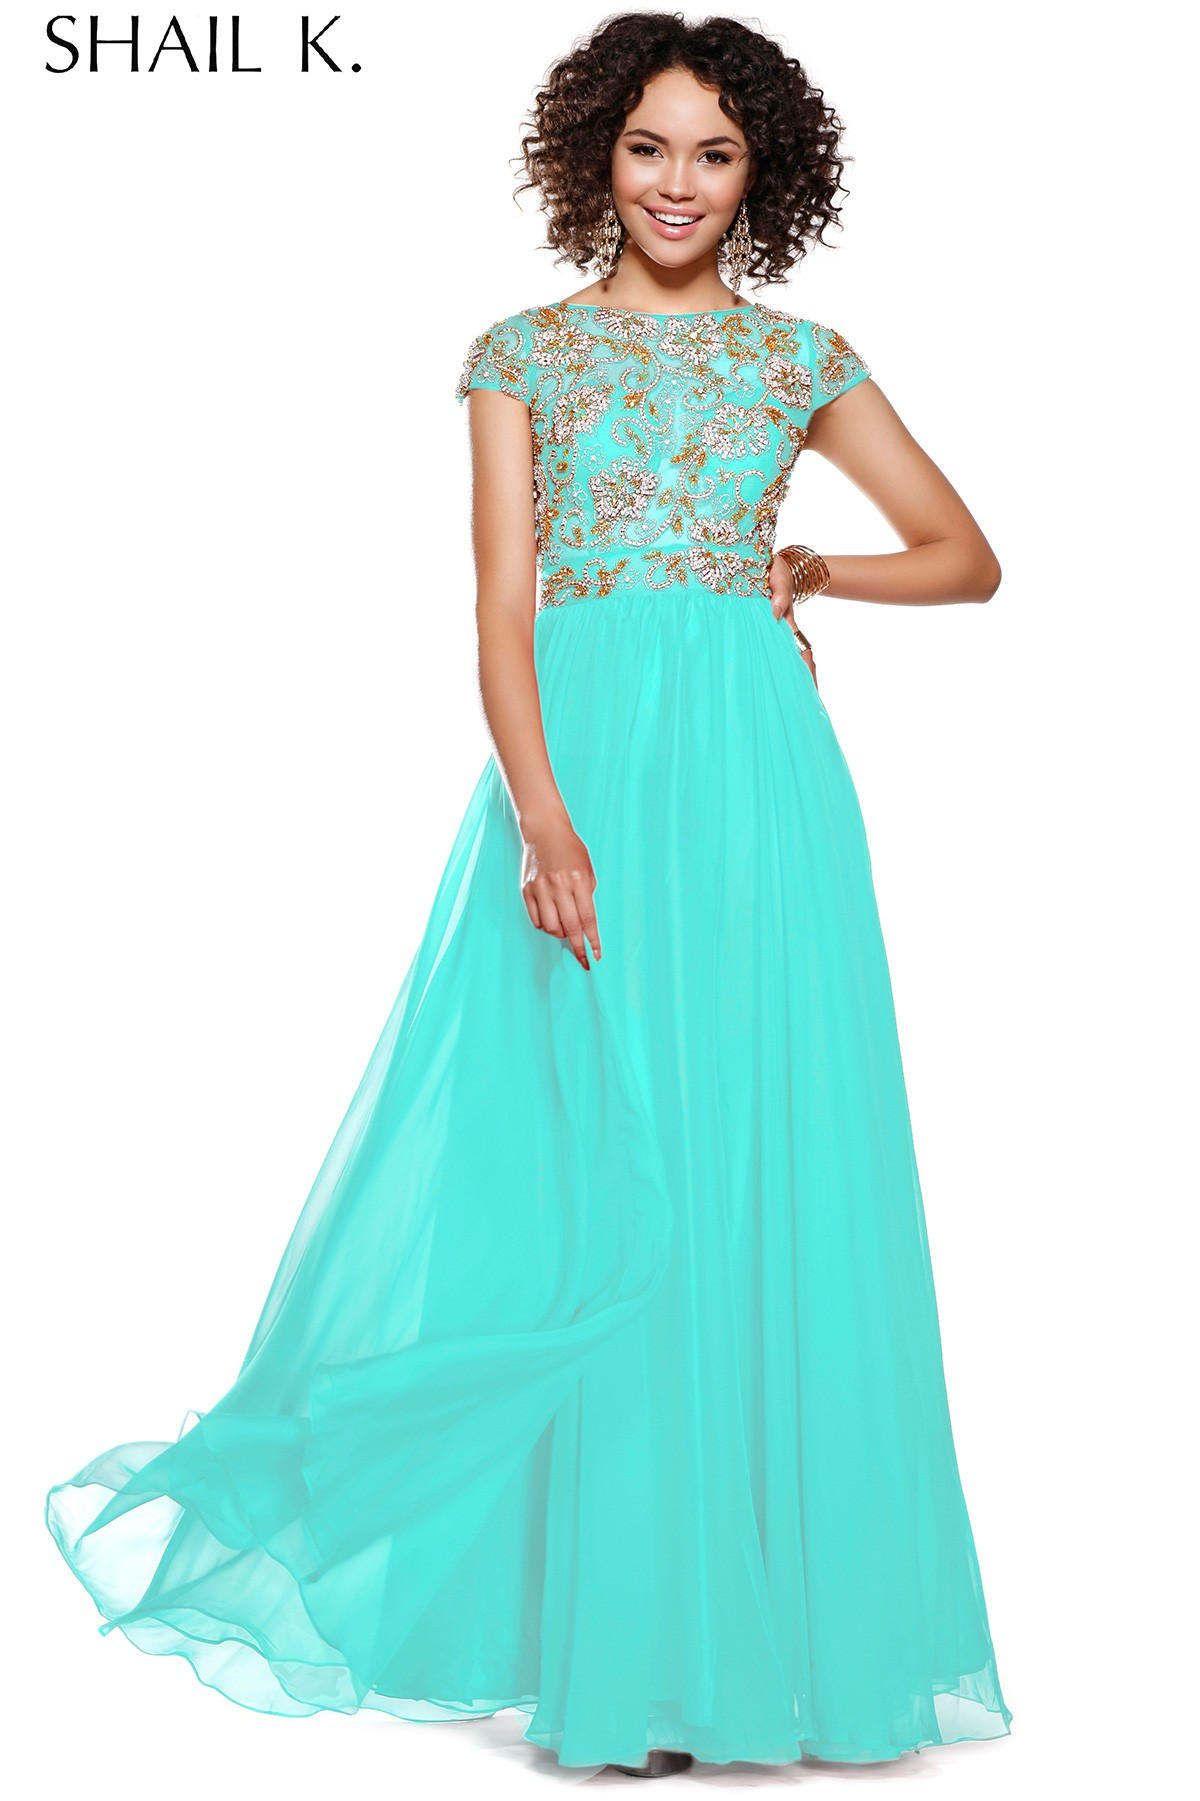 2015 shailk sparkle sequins long prom dresses with modest